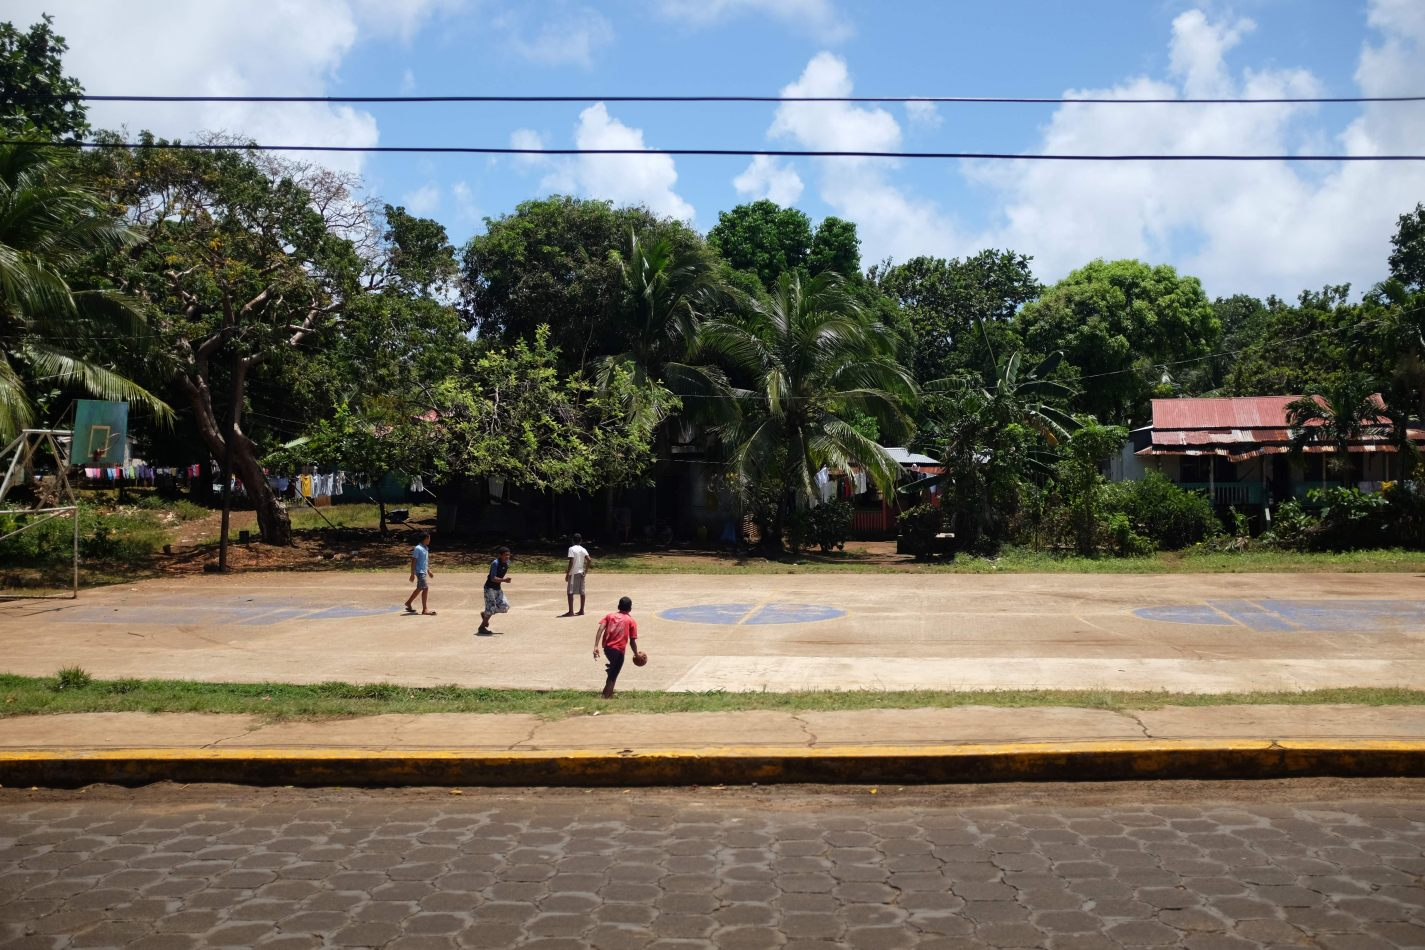 Hibiscus & Nomada : Corn Islands - Kids & Basketball